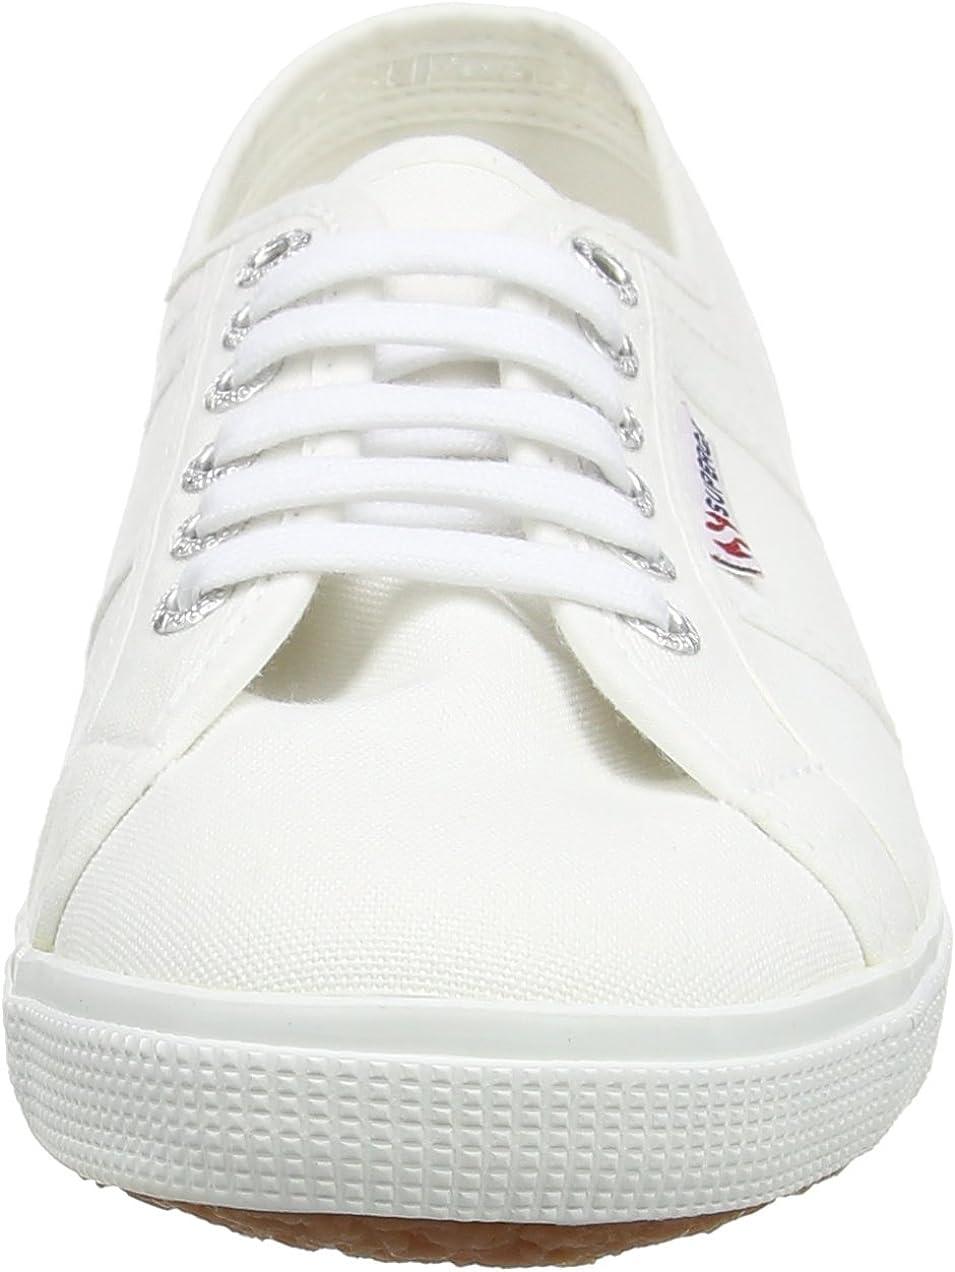 Para Niza Salida De Fábrica Gran Sorpresa Superga 2950-cotu, Zapatillas de Gimnasia para Hombre Blanco White 900 qXkDdS u3pysI 6UfIcq